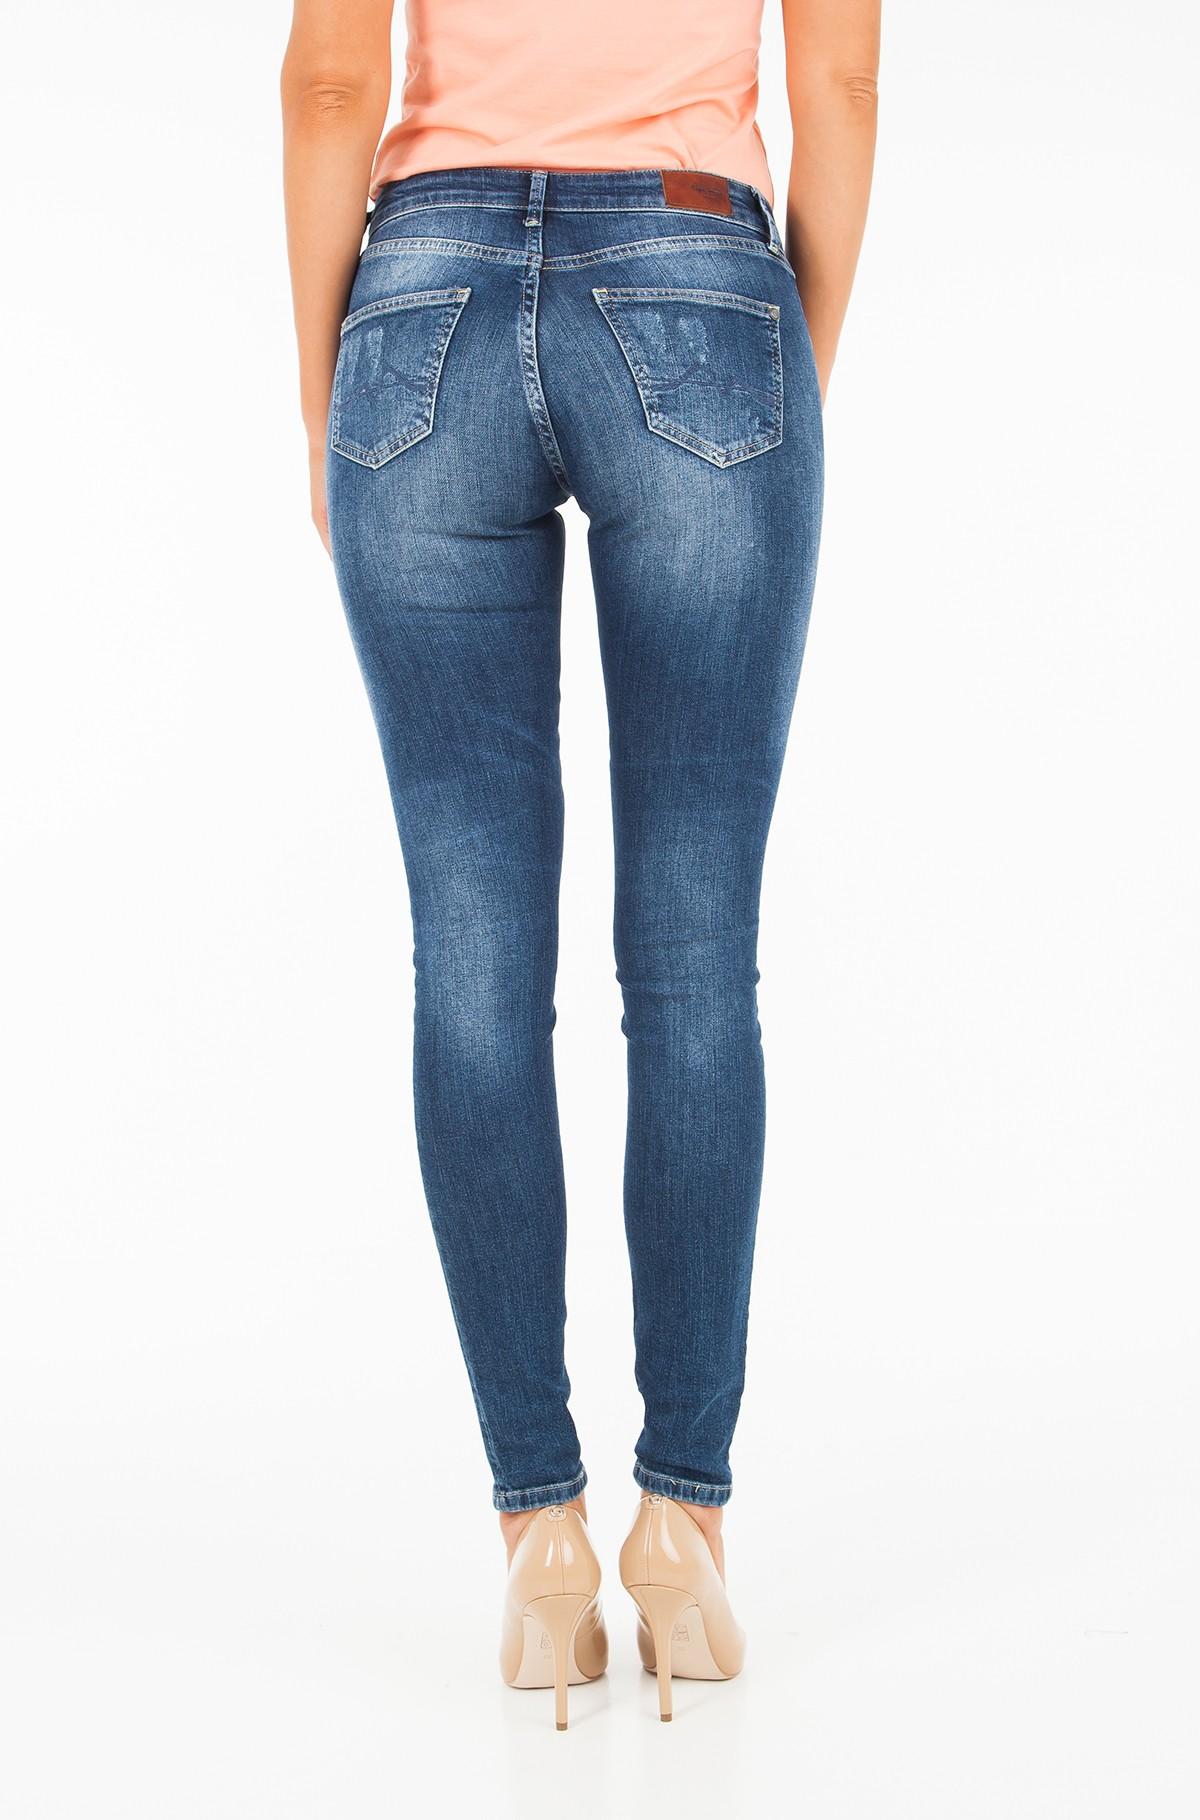 Jeans PIXIE/PL200025RC9-full-2